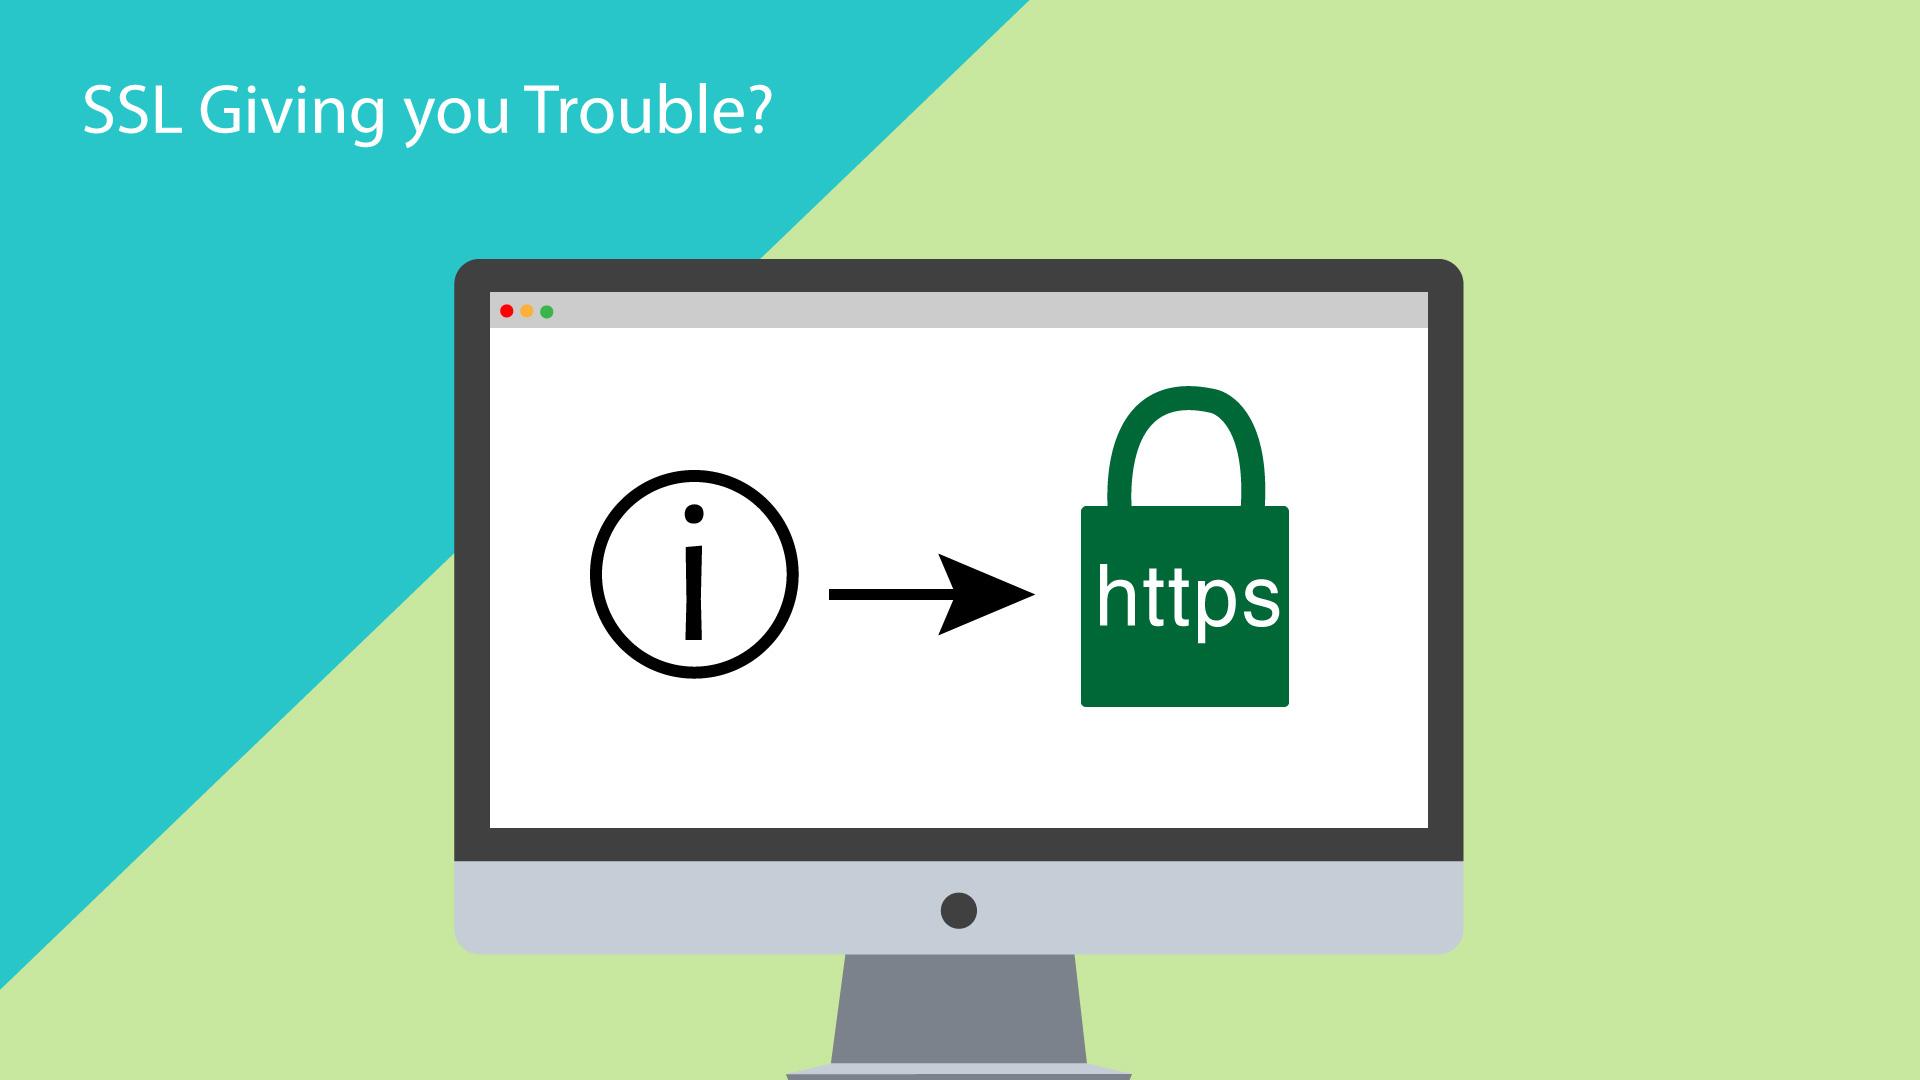 Forcing SSL